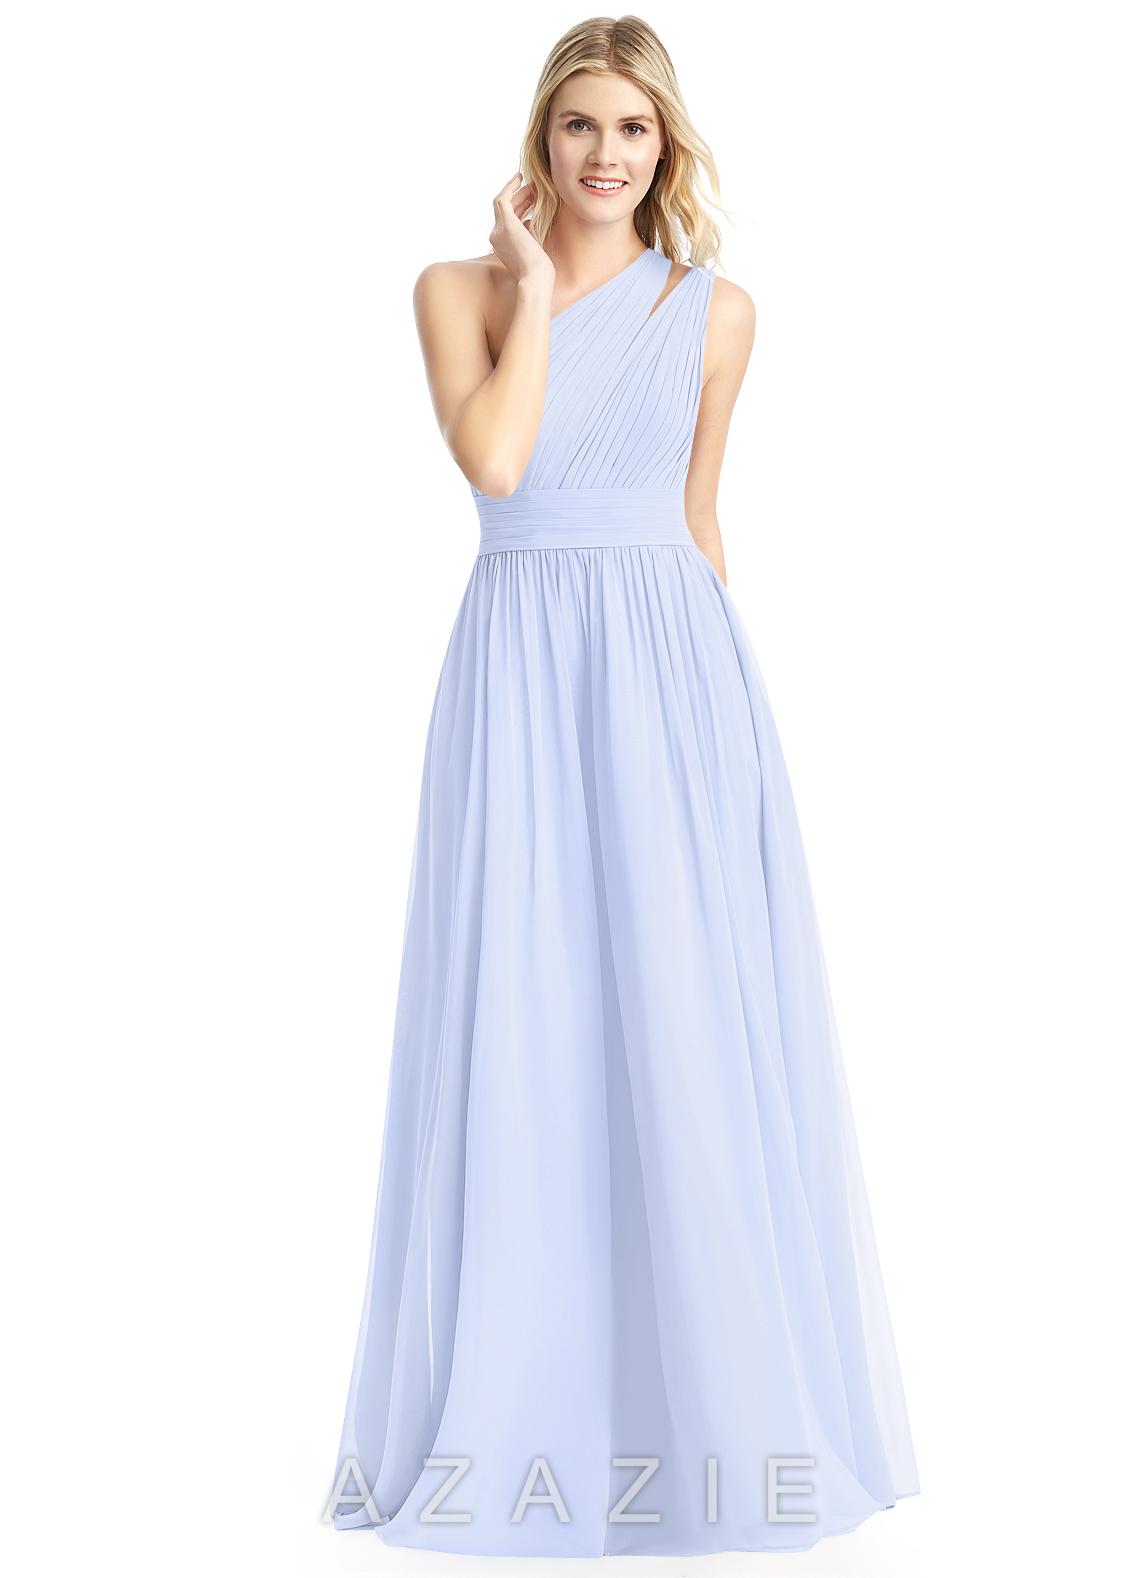 Azazie molly bridesmaid dress azazie loading zoom ombrellifo Image collections